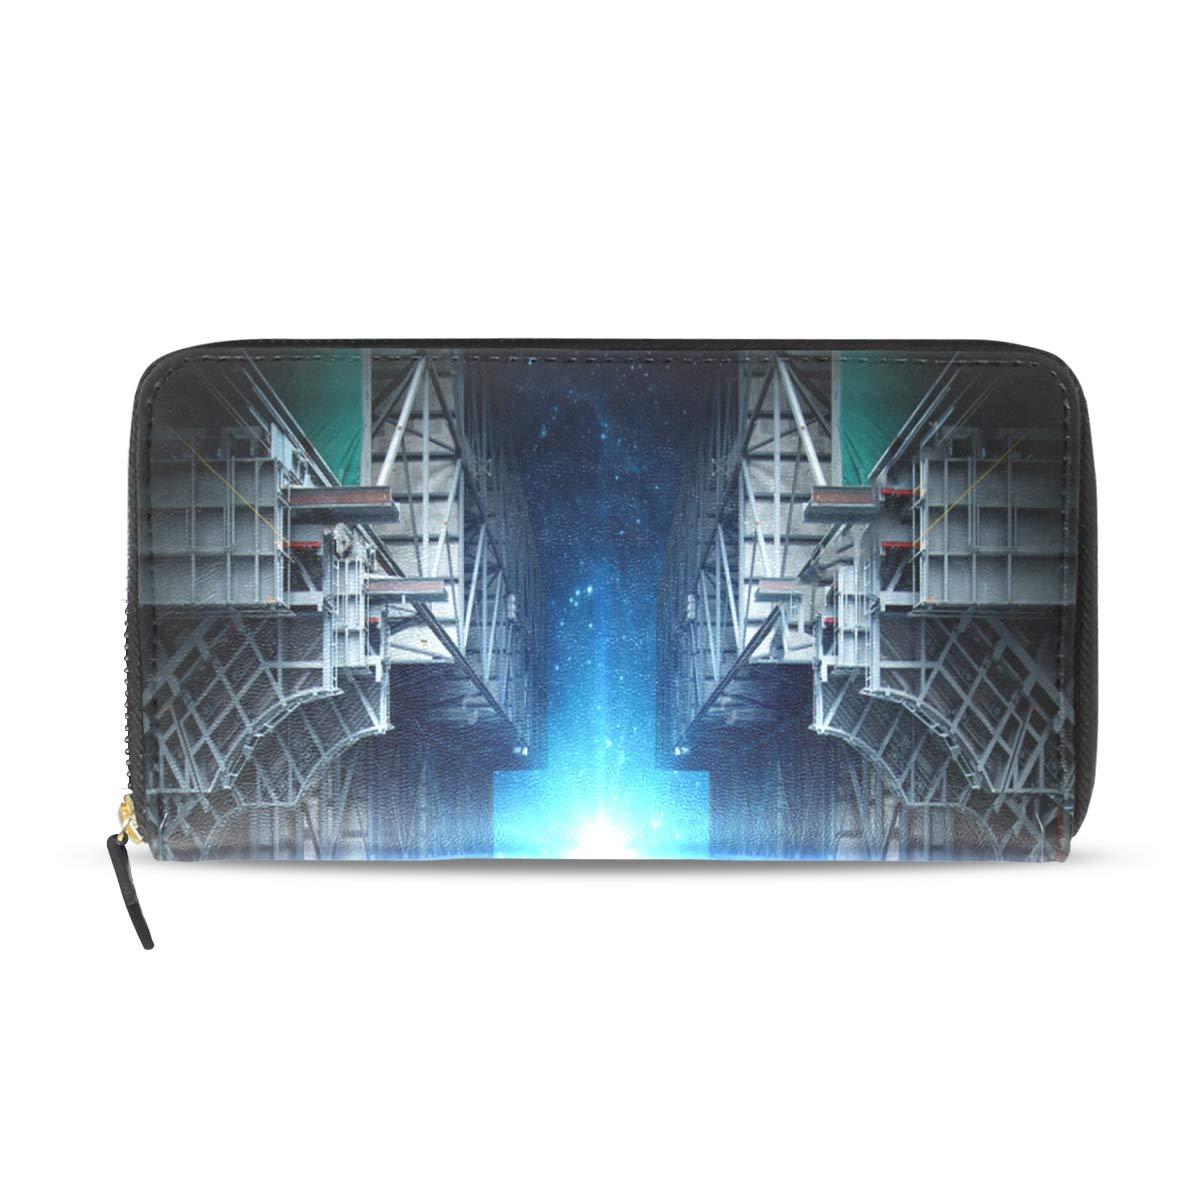 Womens Wallets Kaleidoscope Abstract Mosaic Background Leather Passport Wallet Change Purse Zip Handbags